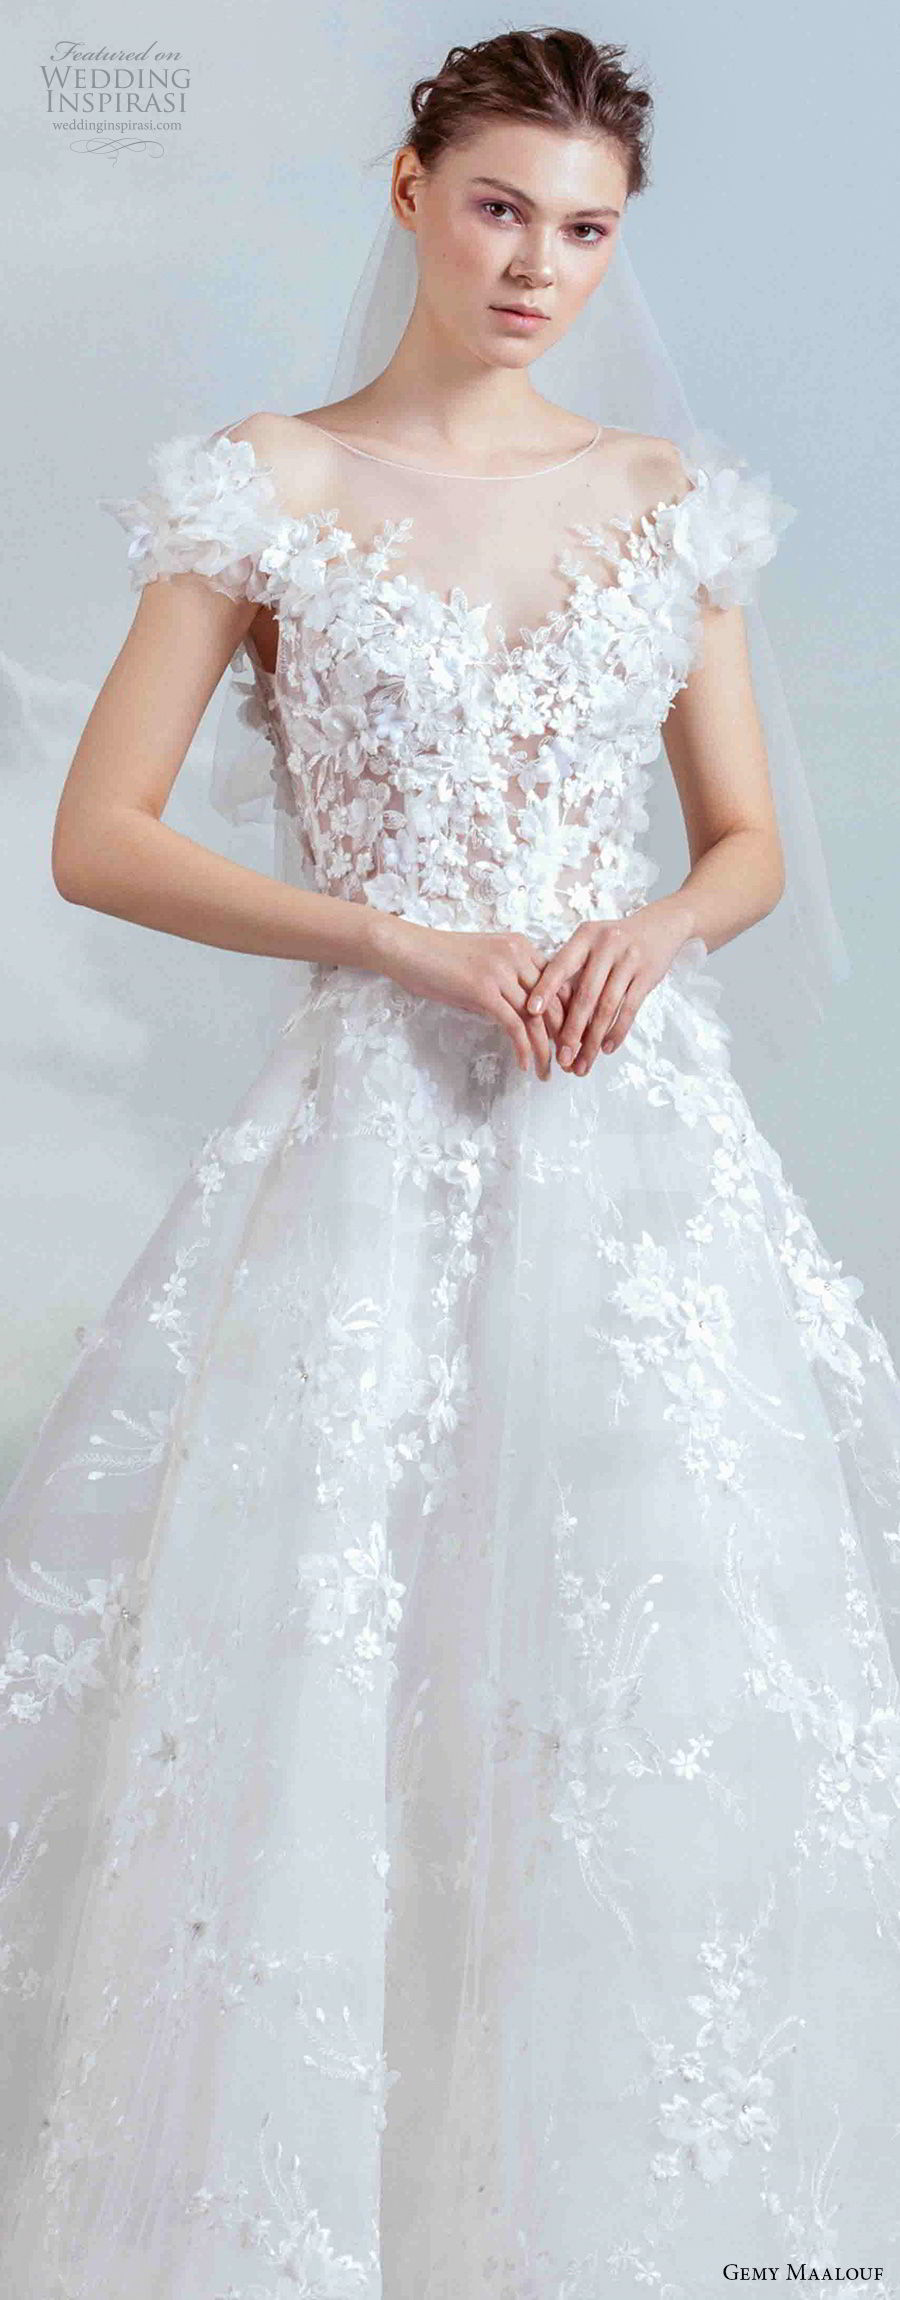 Gemy Maalouf 2019 Wedding Dresses The Royal Bride